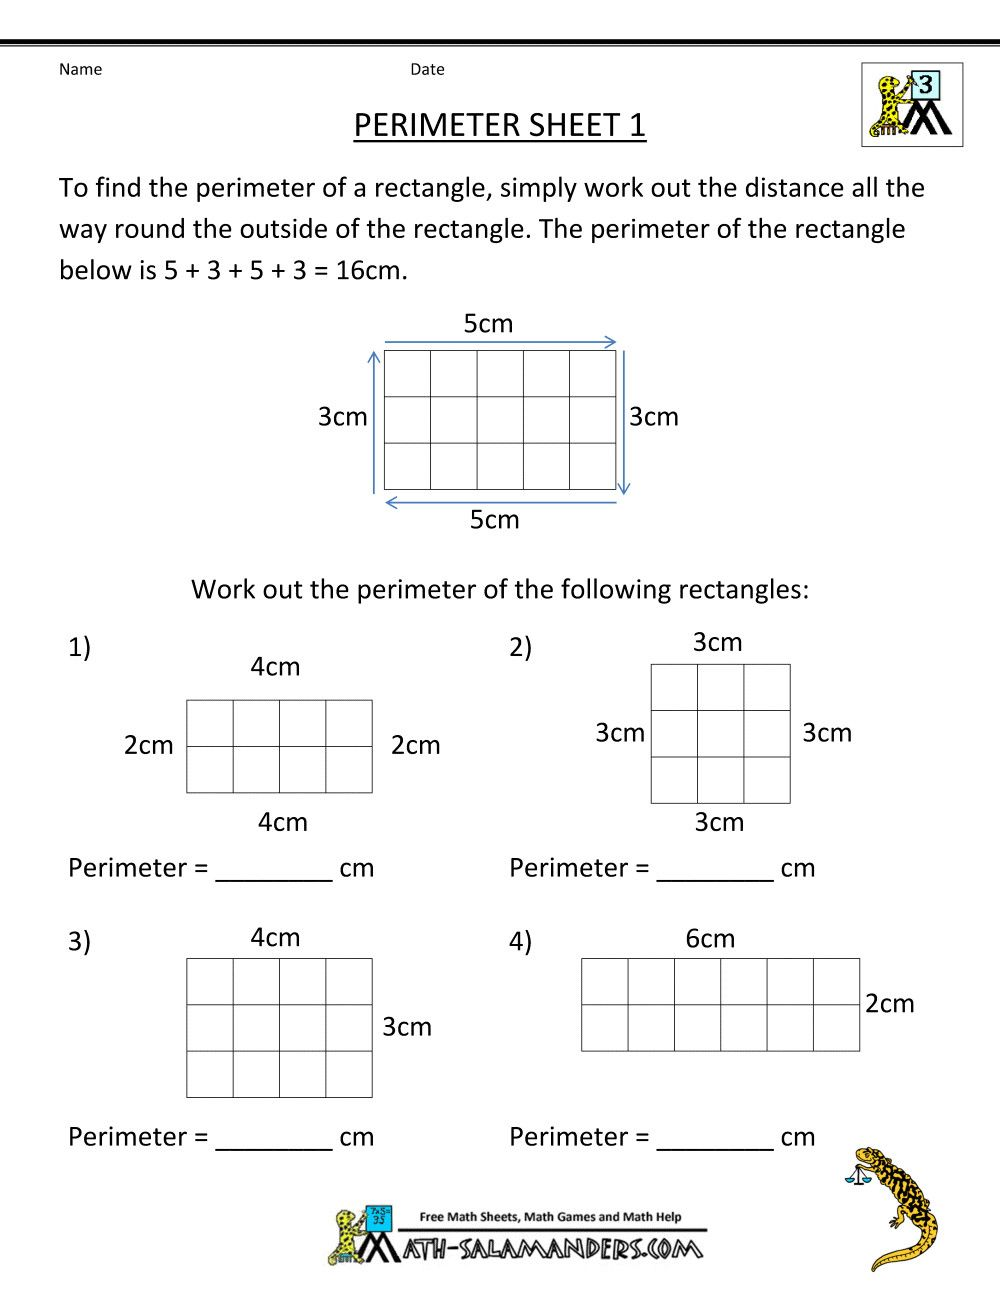 2 5th Grade Math Practice Test Printable free 3rd grade math worksheets perimeter 1